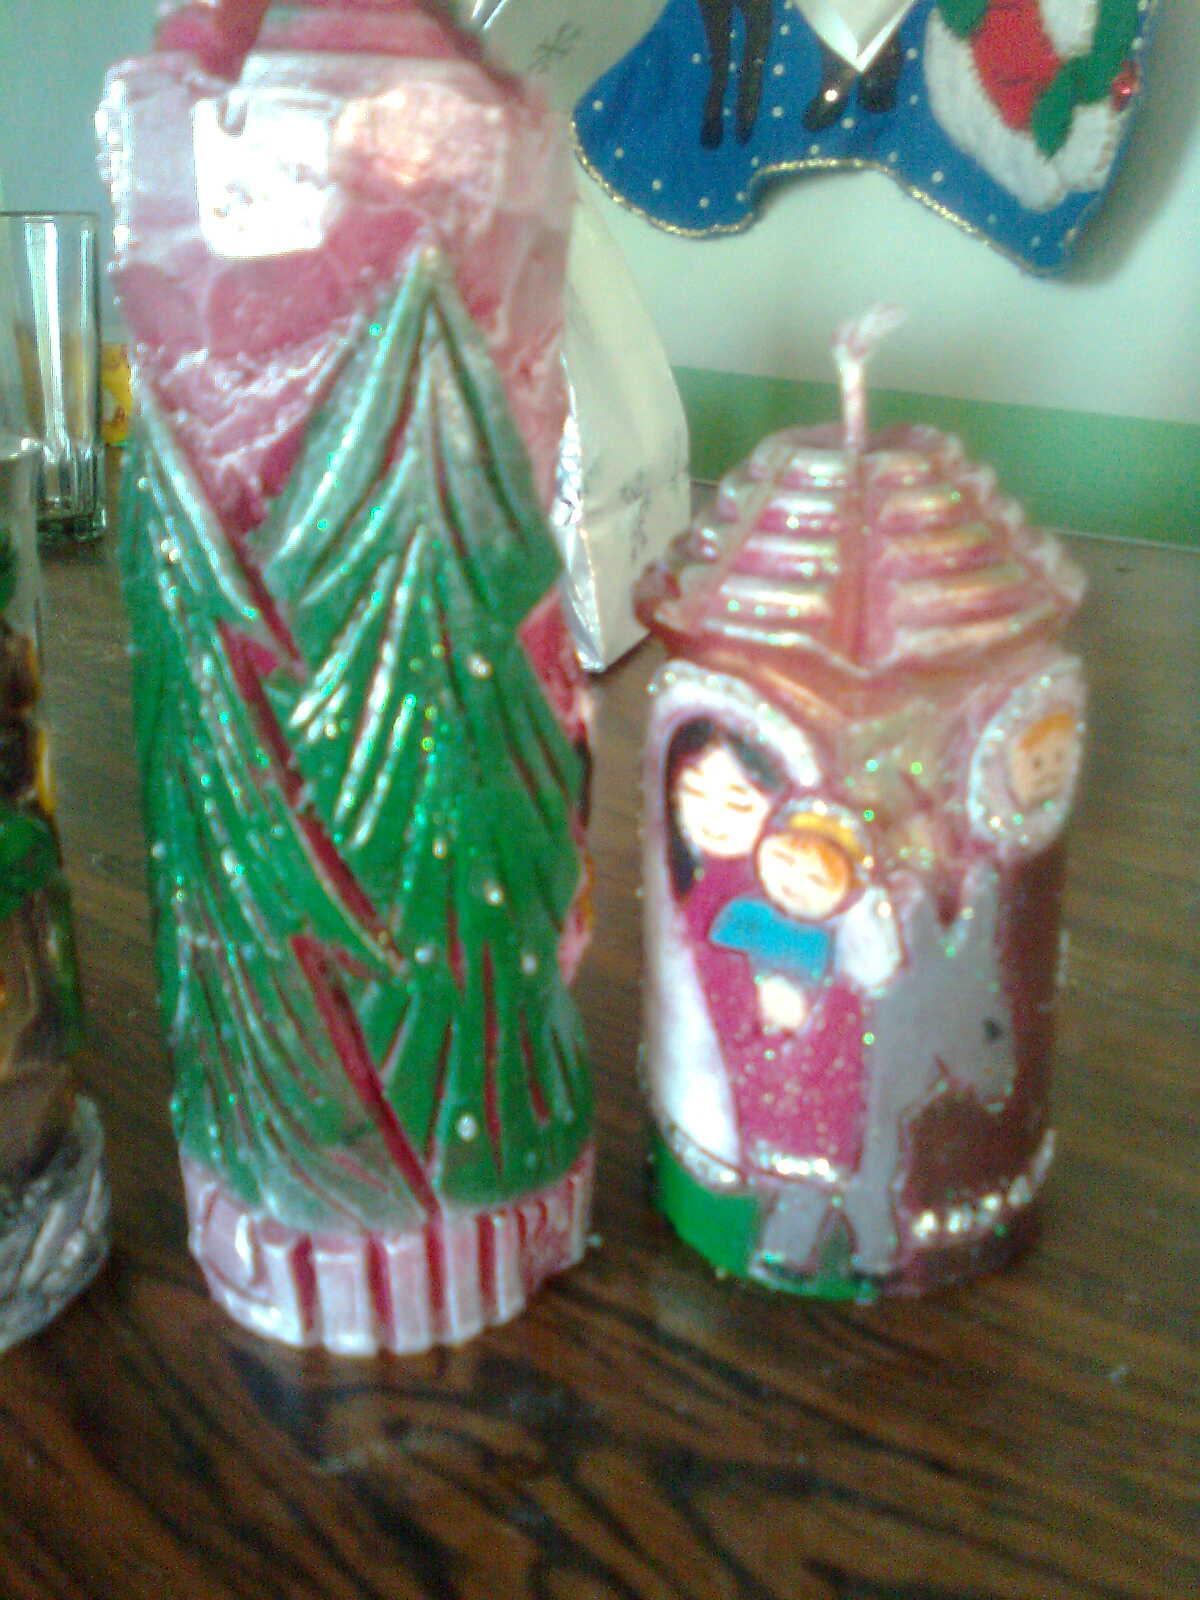 Escuela artesanal sara emilia gonz lez velas talladas - Velas talladas ...